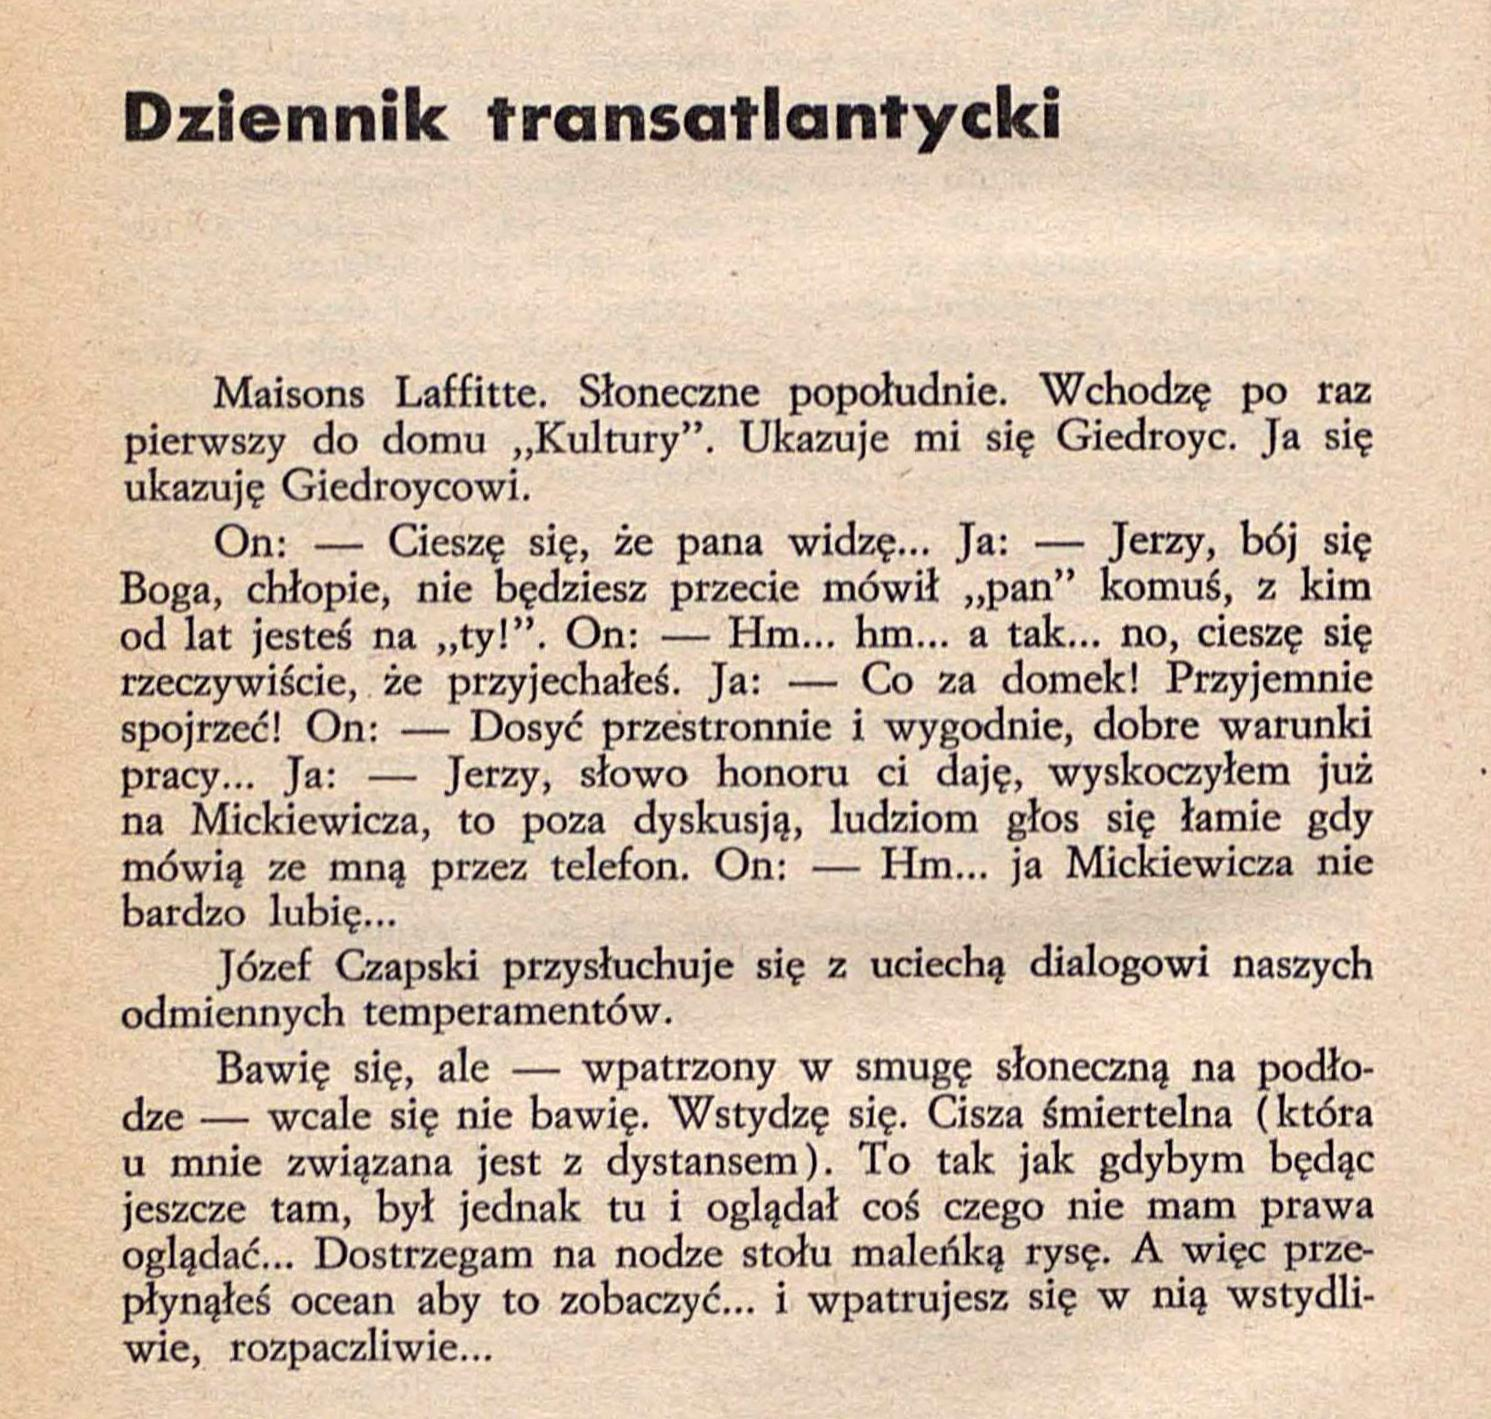 "<div class='inner-box'><div class='close-desc'></div><span class='opis'>Fragment ""Dziennika transatlantyckiego"" Witolda Gombrowicza. Pierwsze chwile w Maisons-Laffitte. ""Kultura"" nr 11/193, 1963 r., s. 24</span><div class='clearfix'></div><span>Шифр  sm00033</span><div class='clearfix'></div><span>© Instytut Literacki</span></div>"